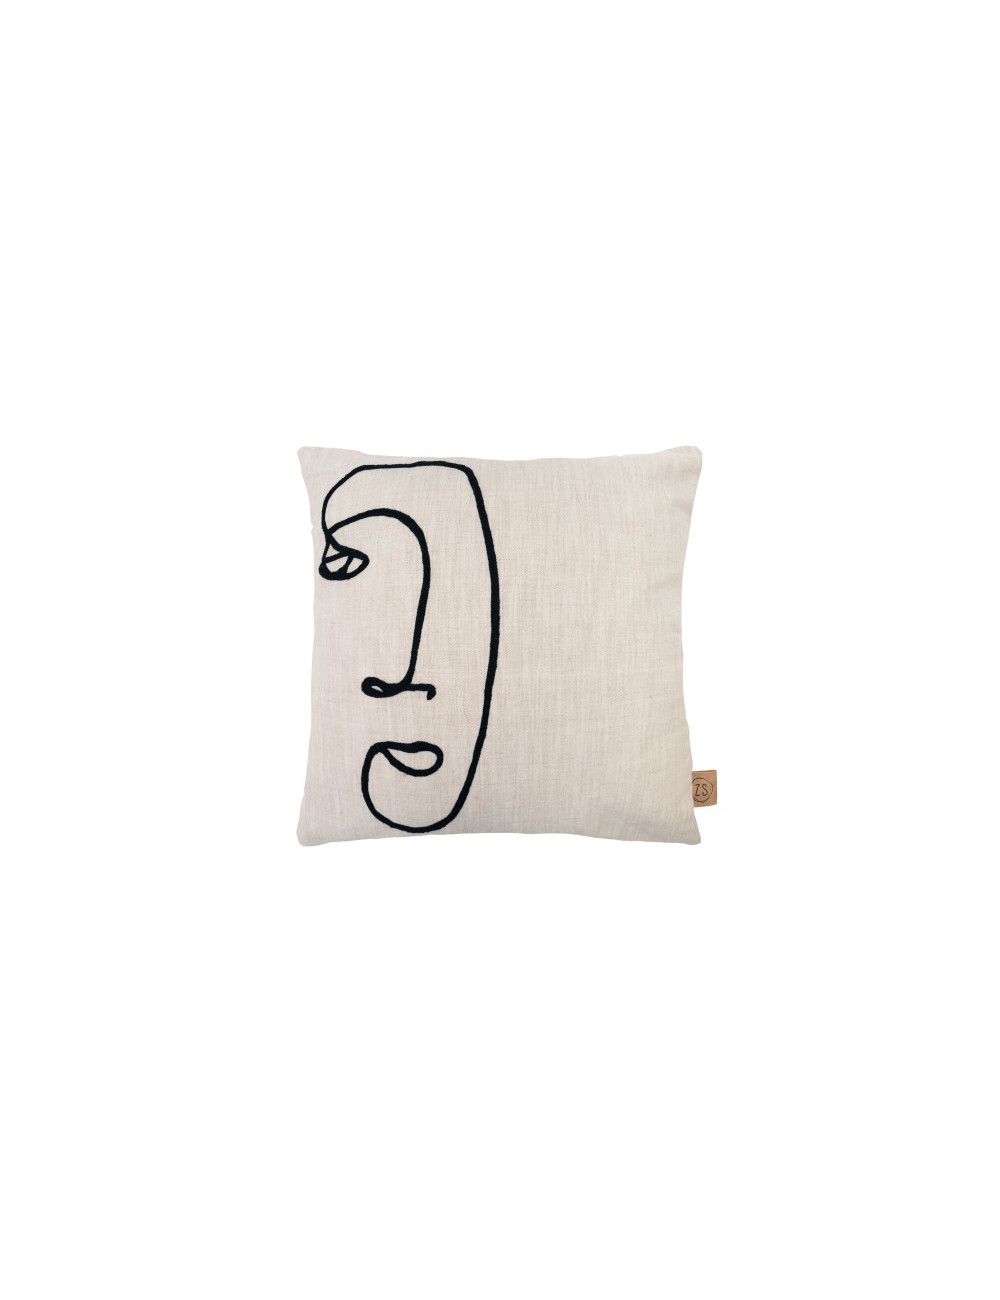 Kussen gezicht 45x45cm | peper en zout